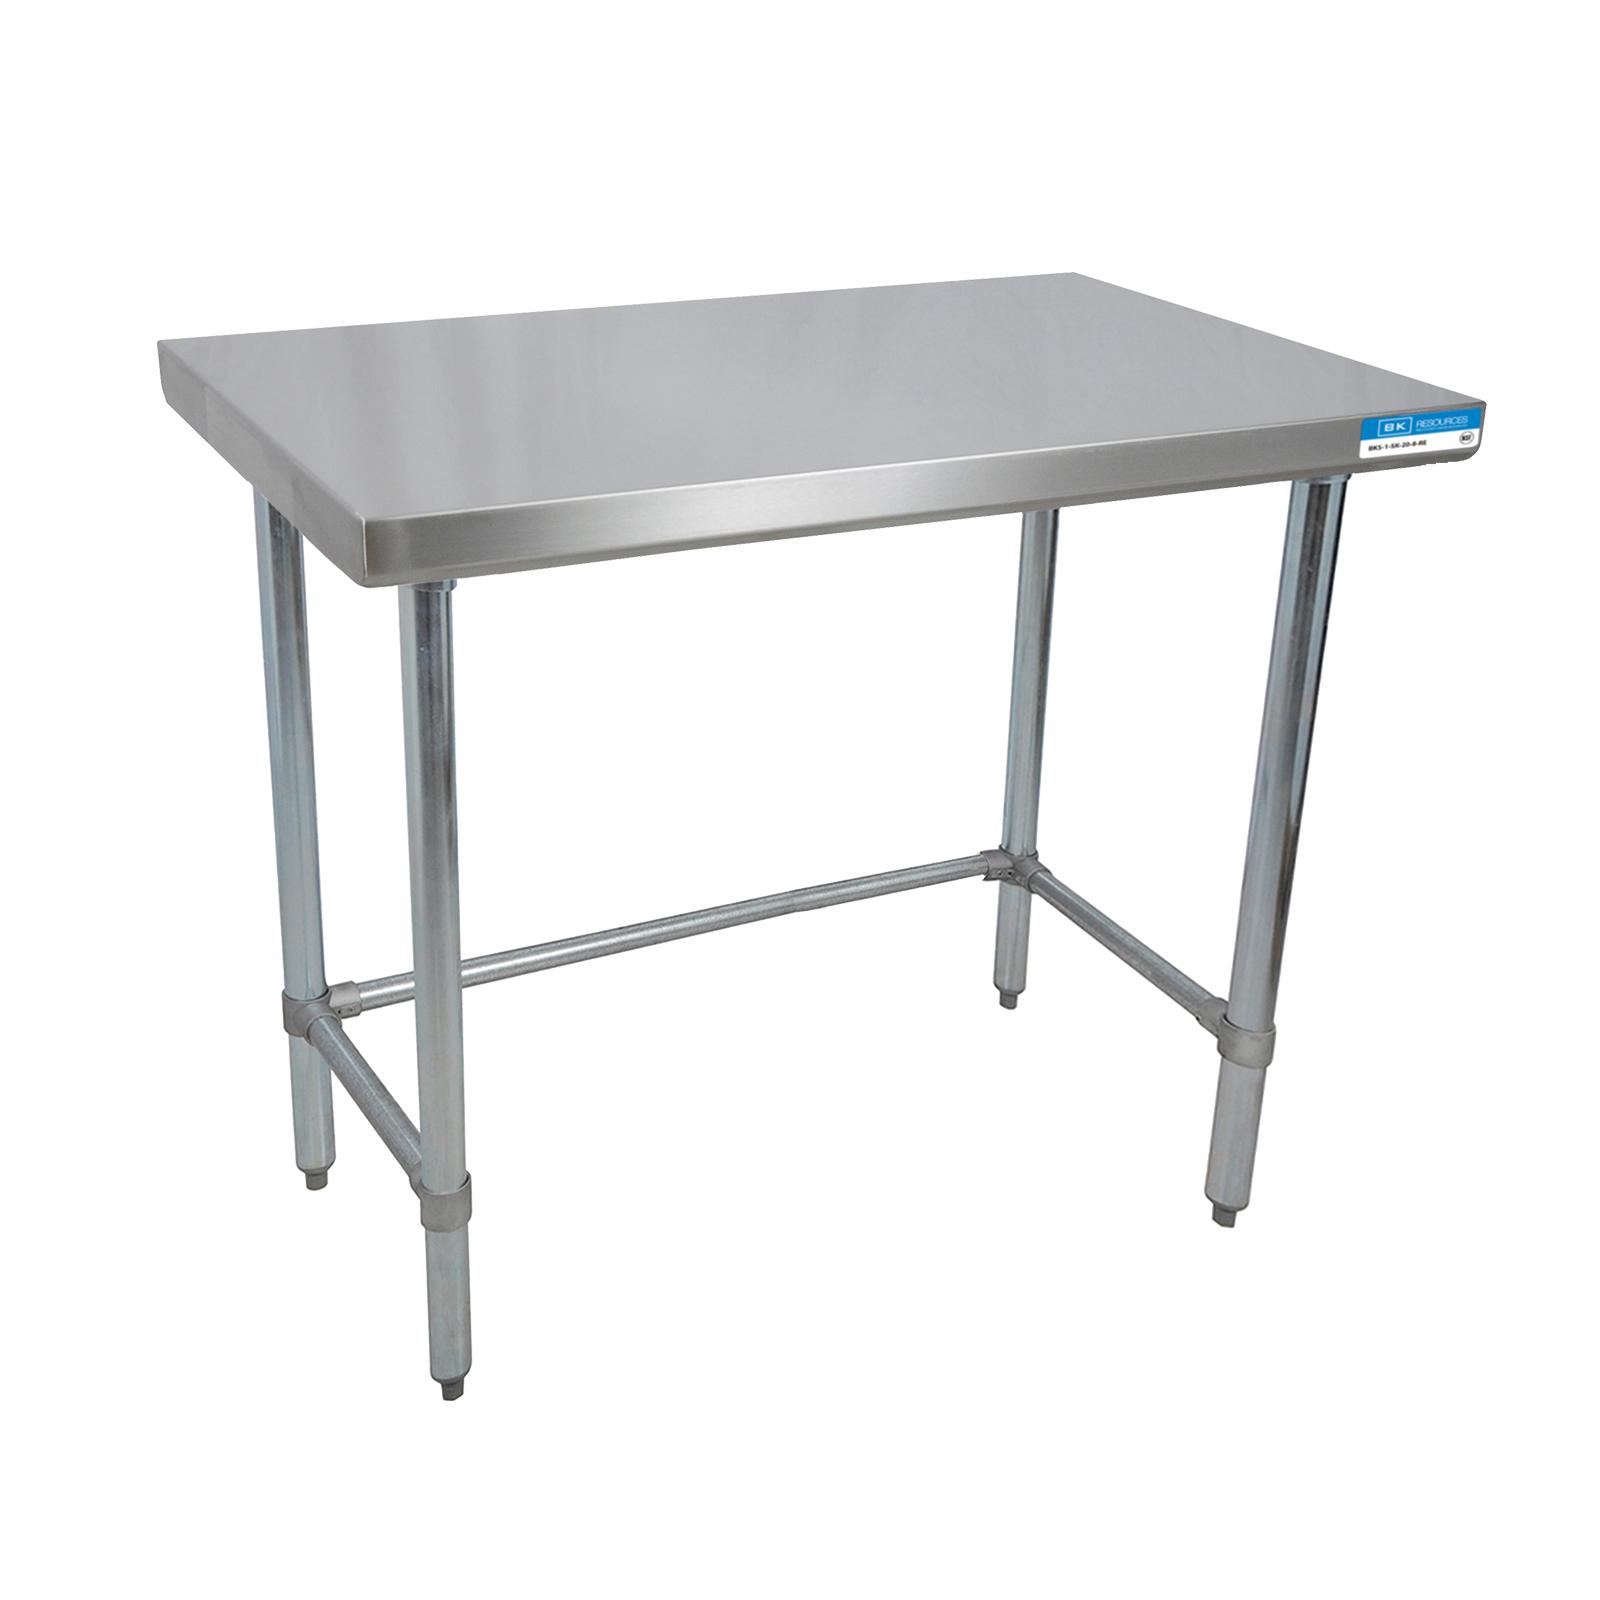 BK Resources SVTOB-1848 work table,  40